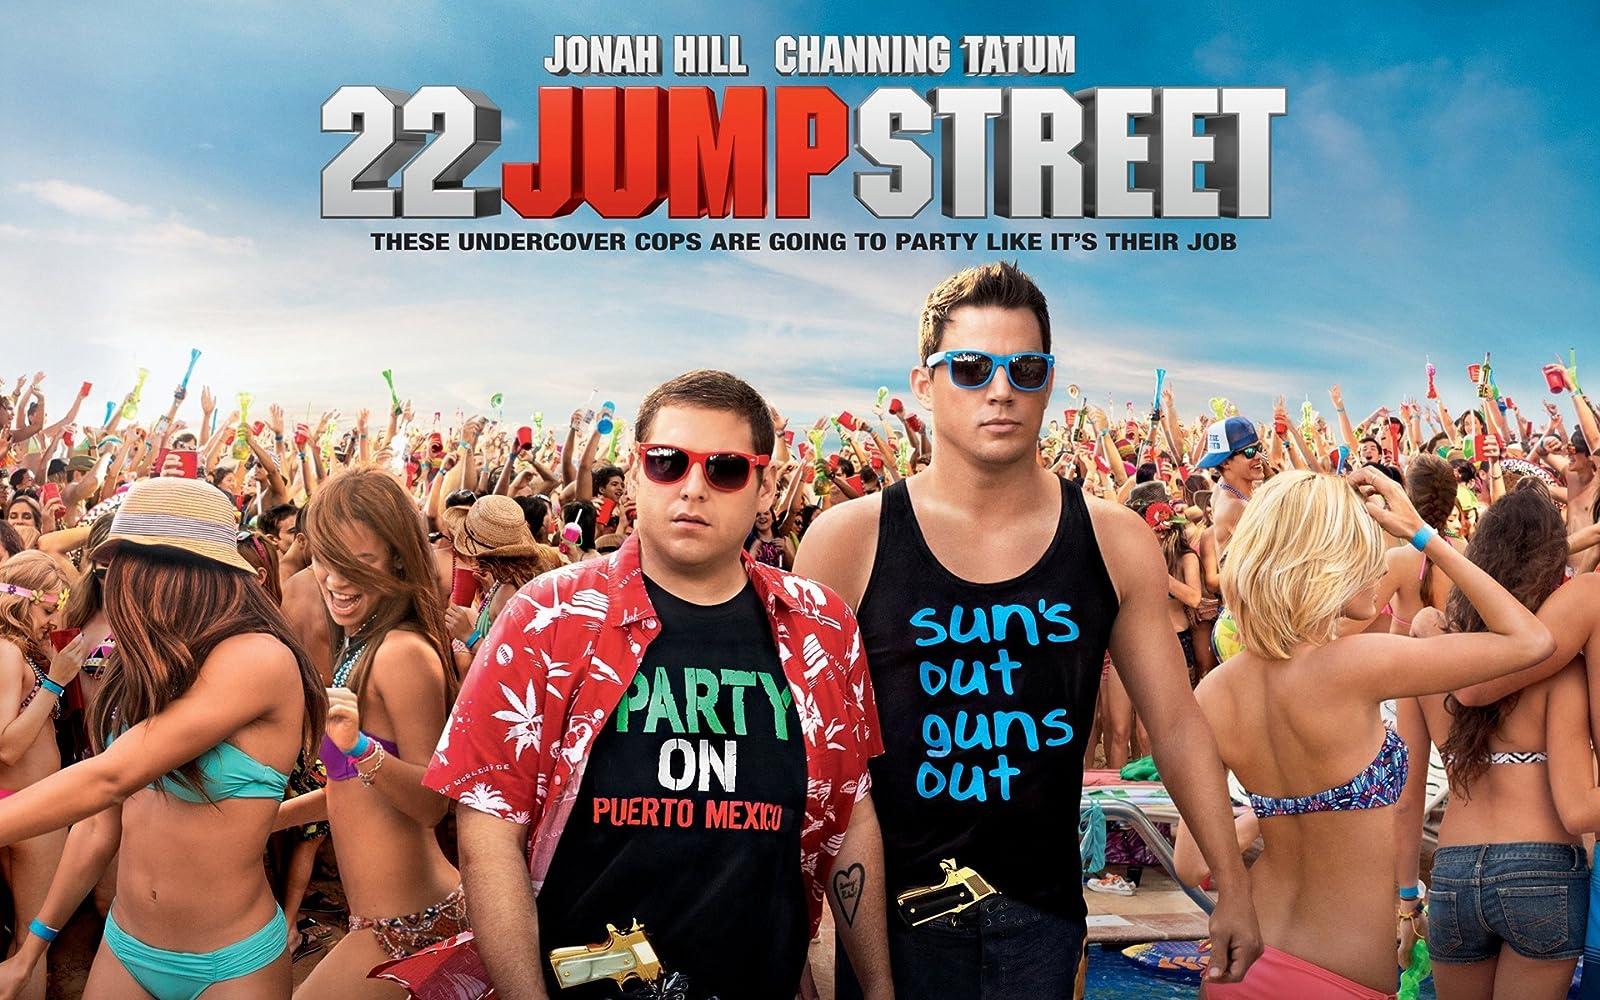 دانلود فیلم 22 jump street